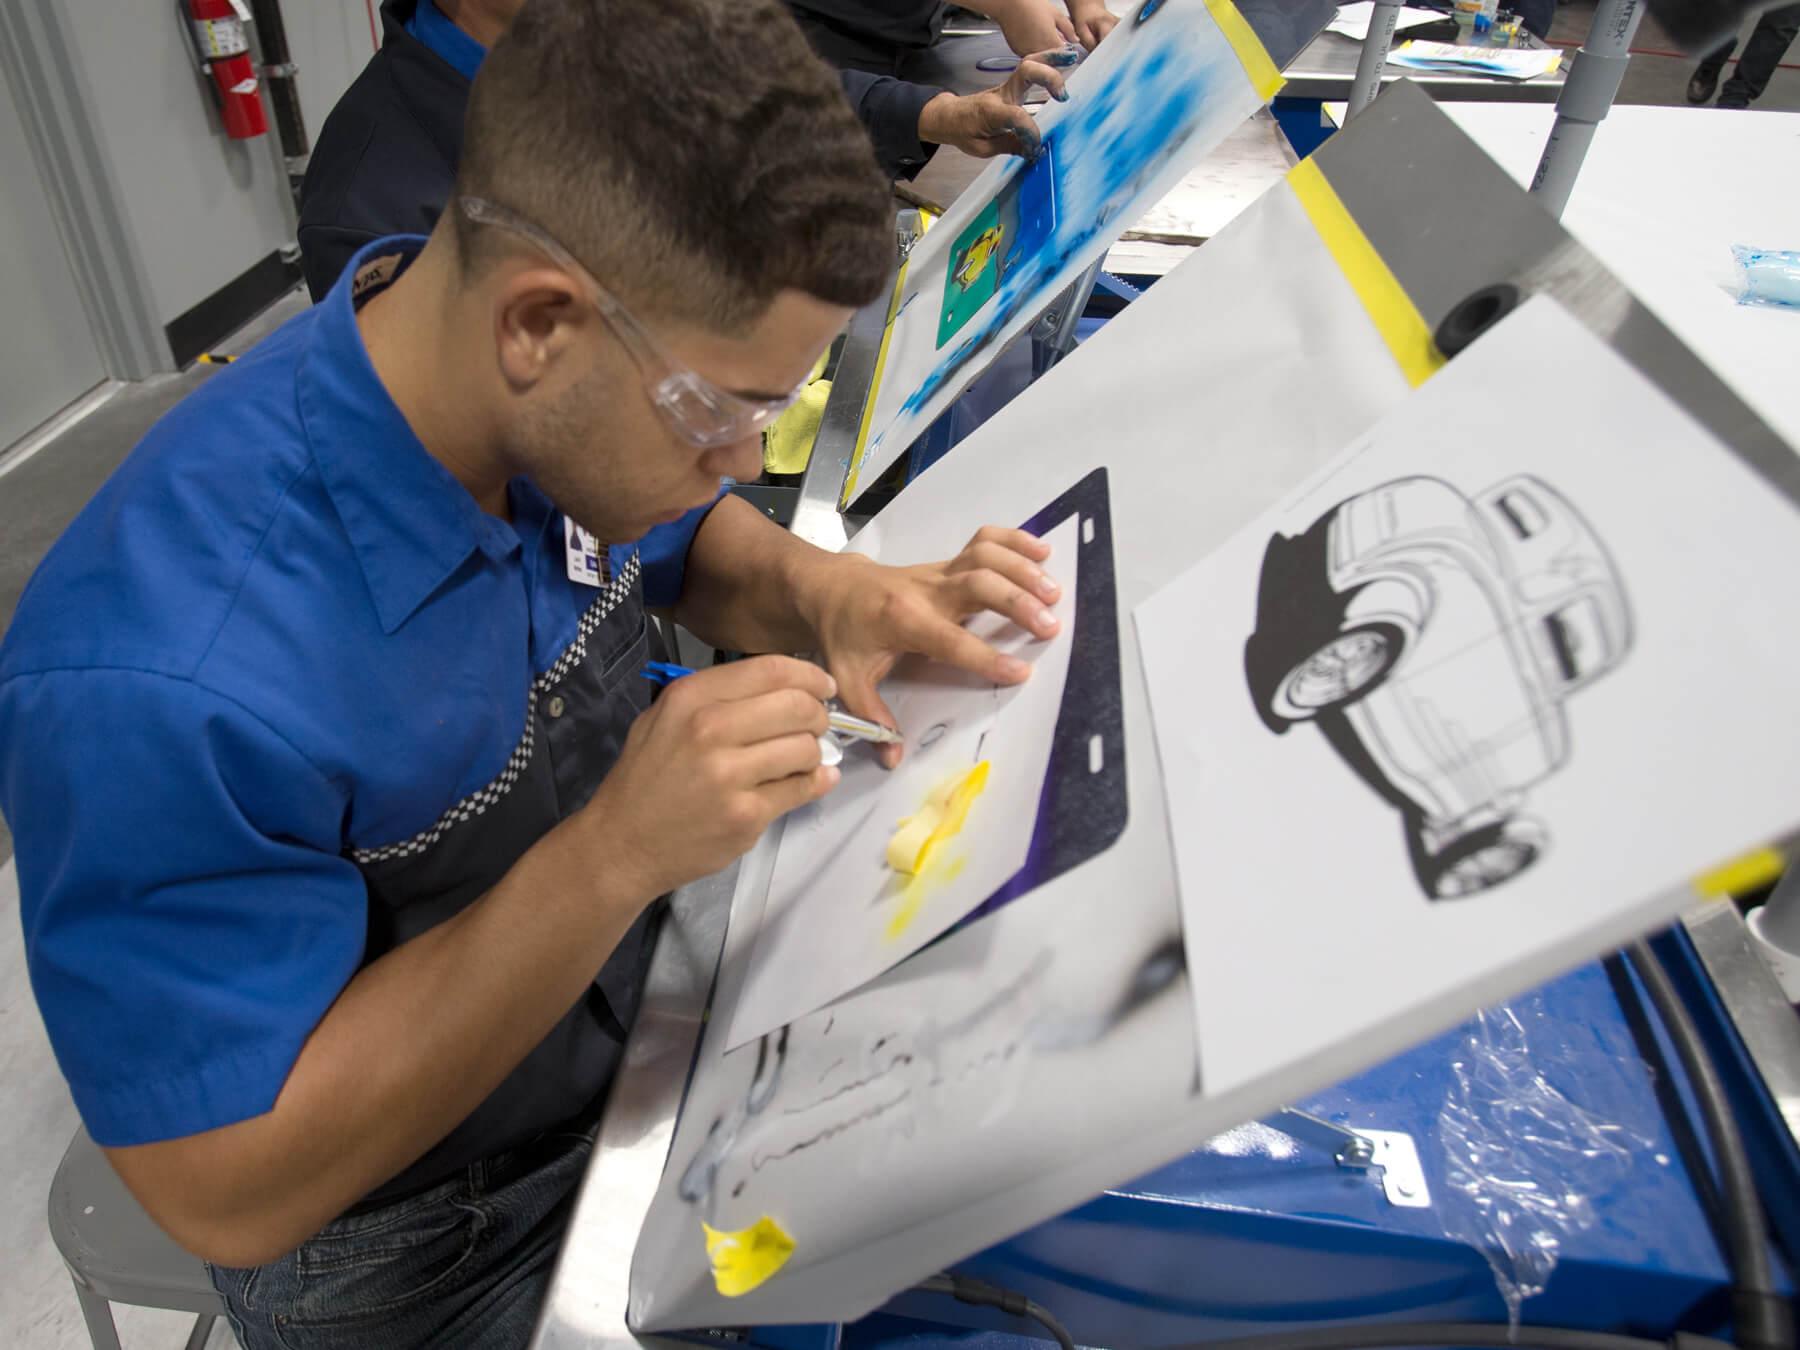 Collision Repair student practicing airbrushing